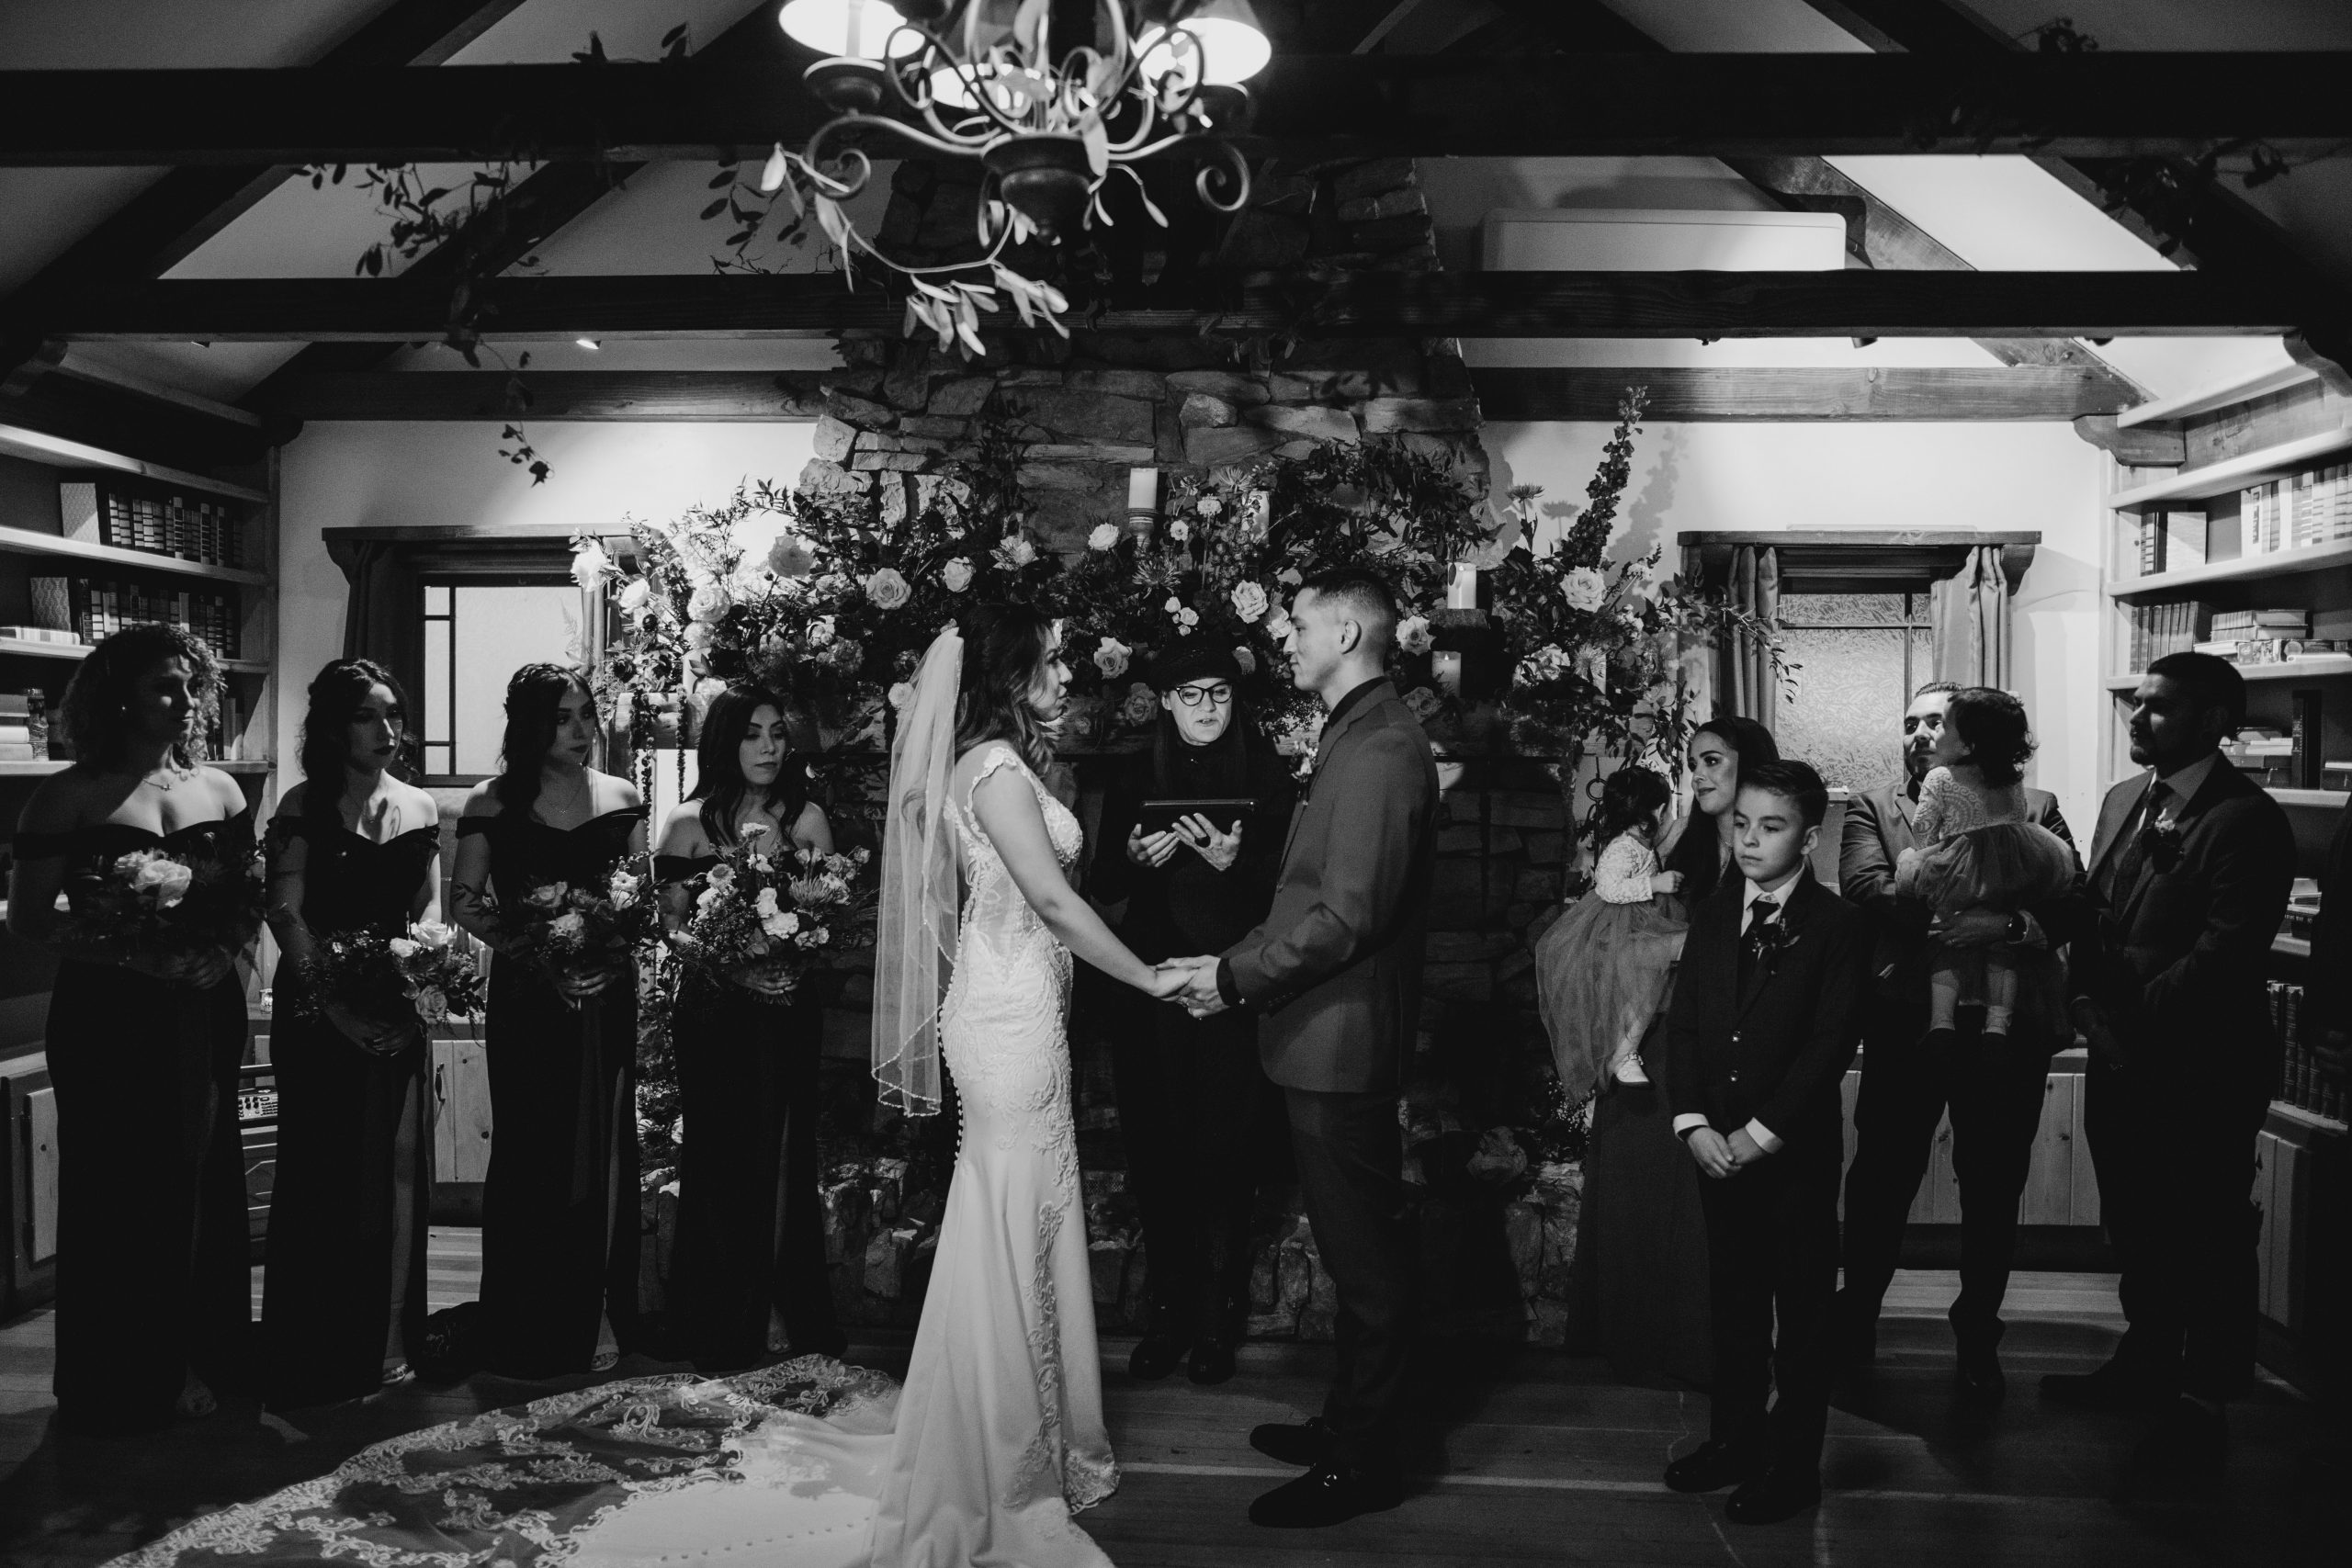 Arrowhead Pine Rose Wedding Ceremony, image by Fatima Elreda Photo